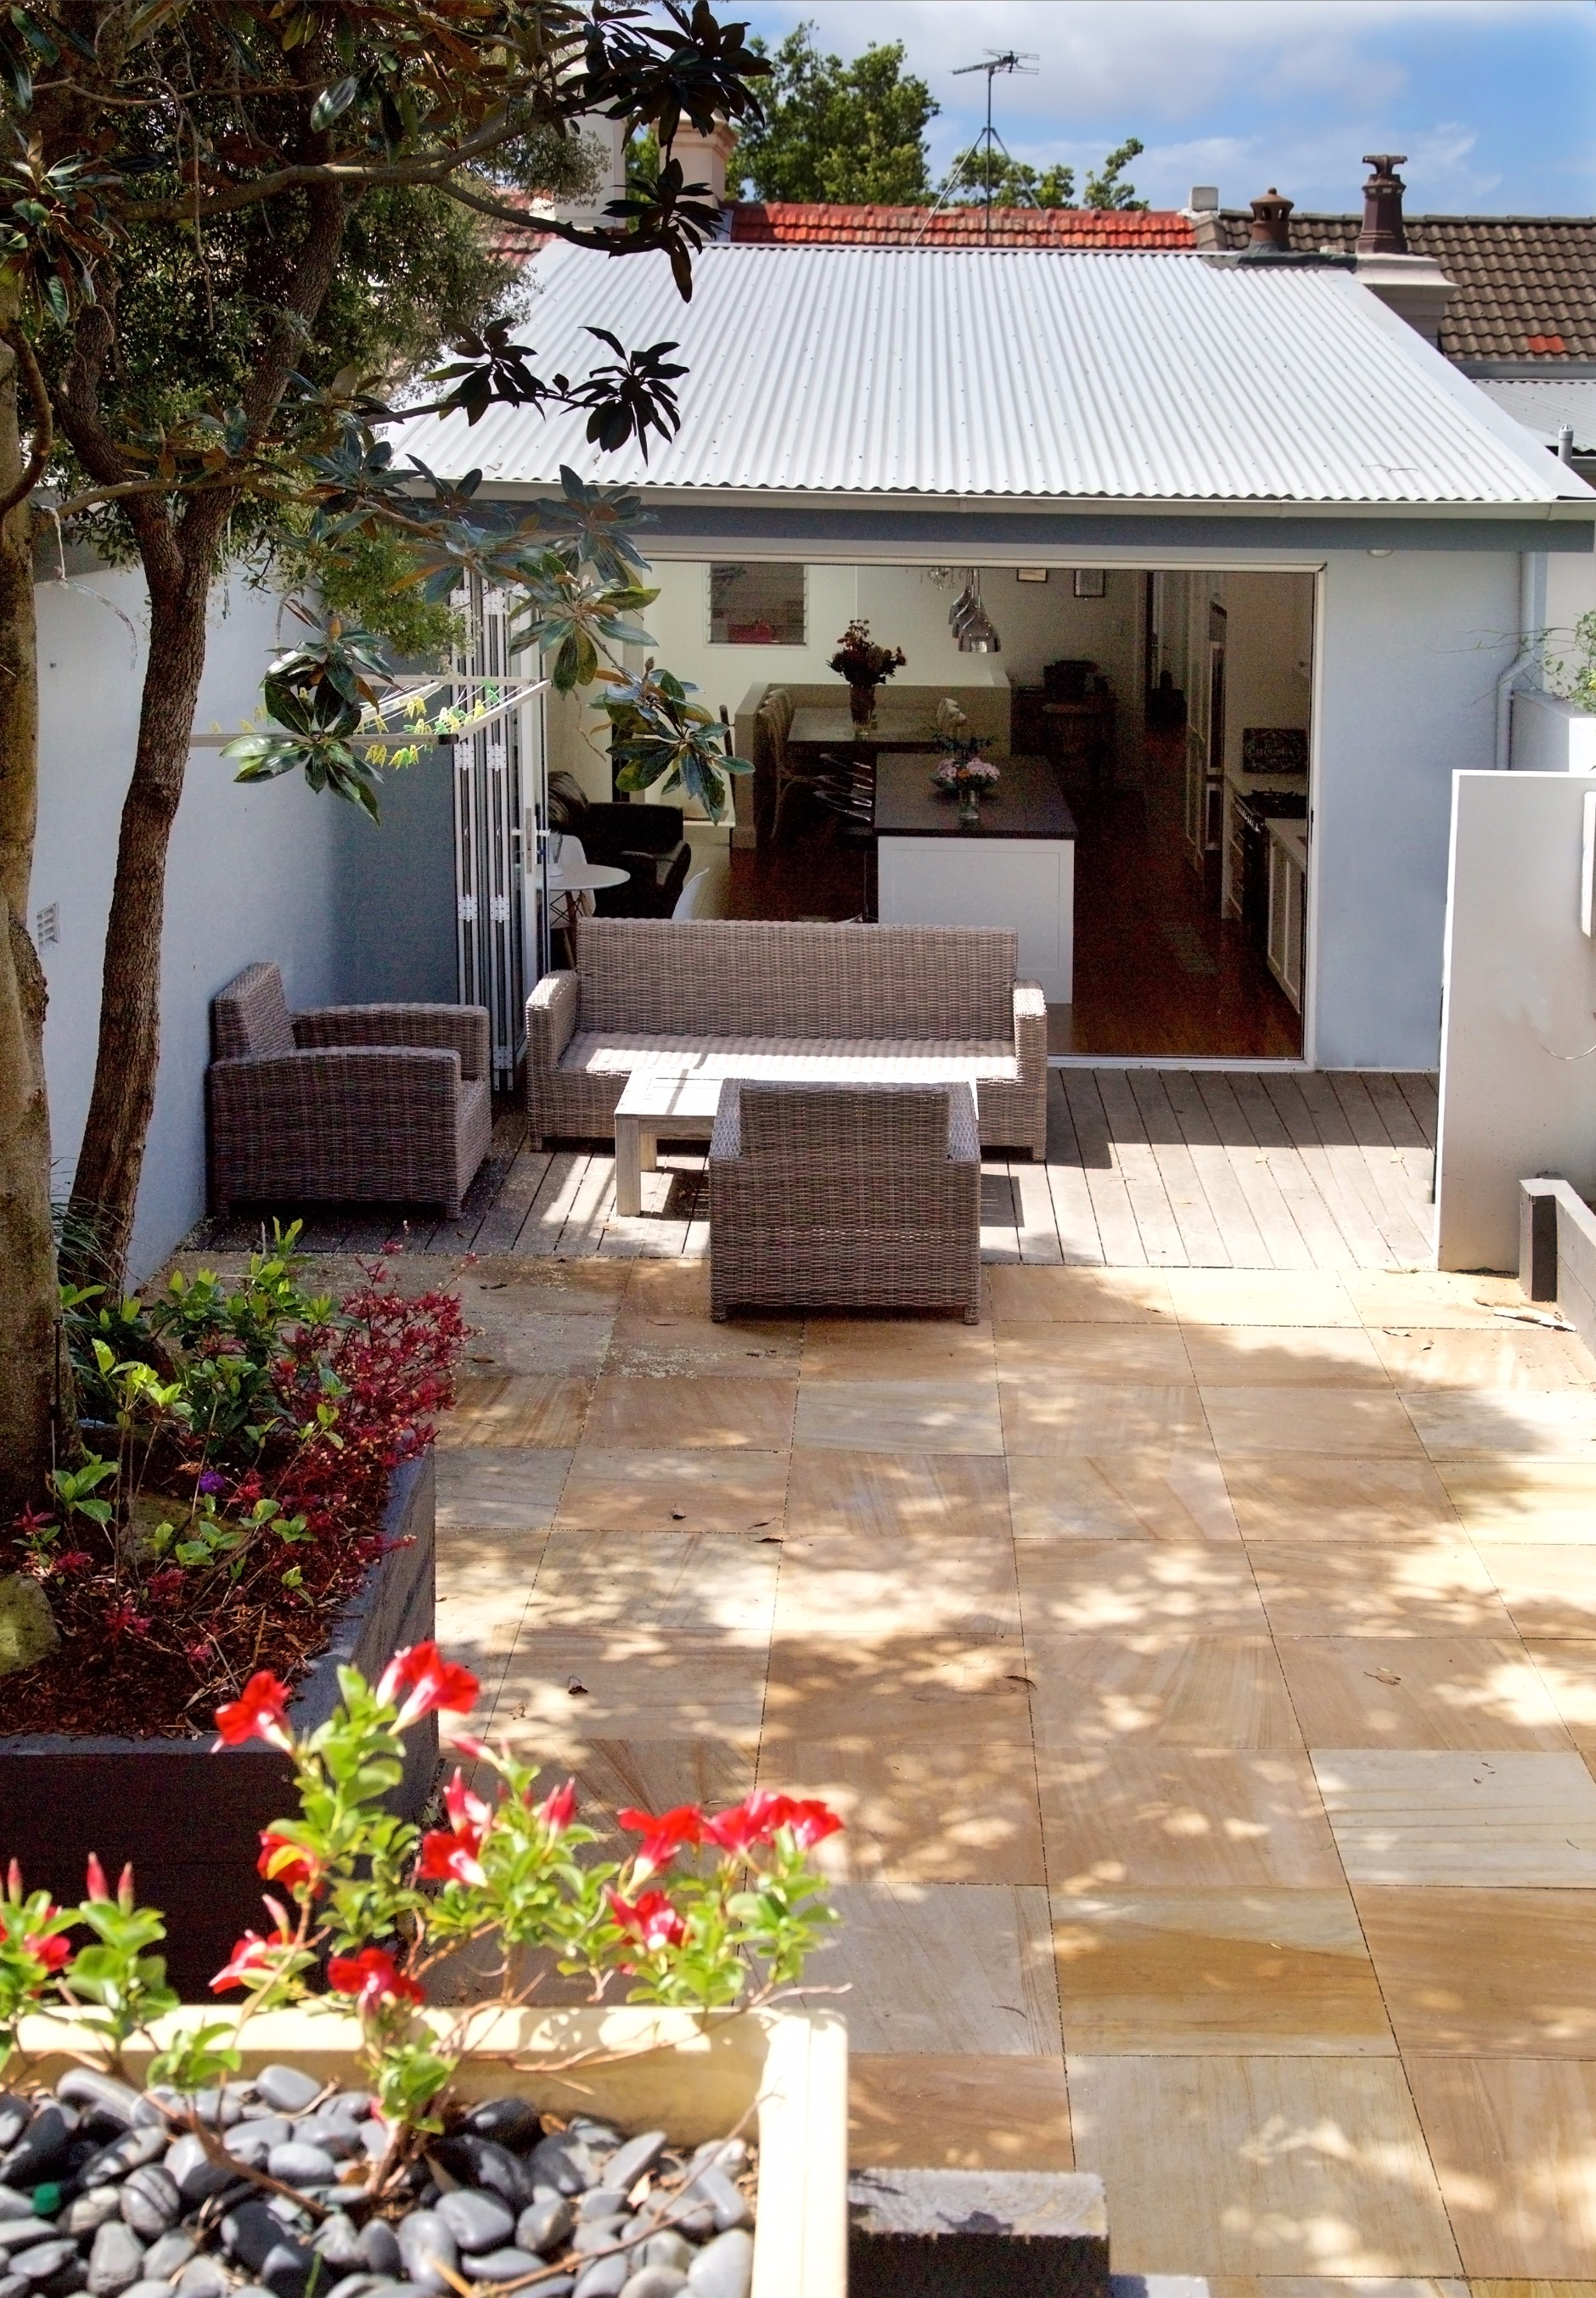 Nvisage_Custom_Design_Homes_Alterations_Additions_Partington8.jpg